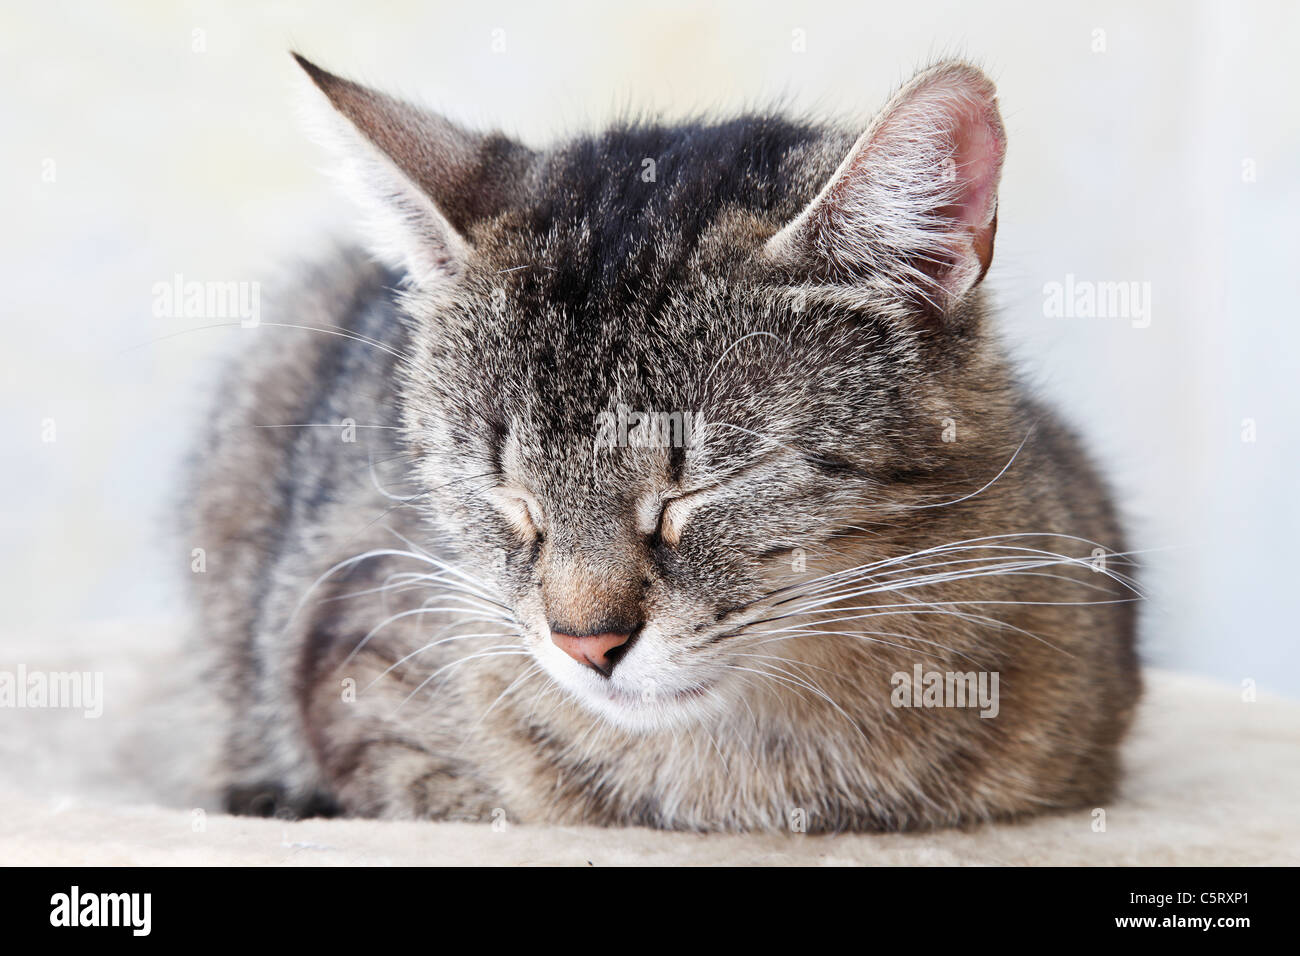 Domestic cat sleeping, portrait, close-up - Stock Image